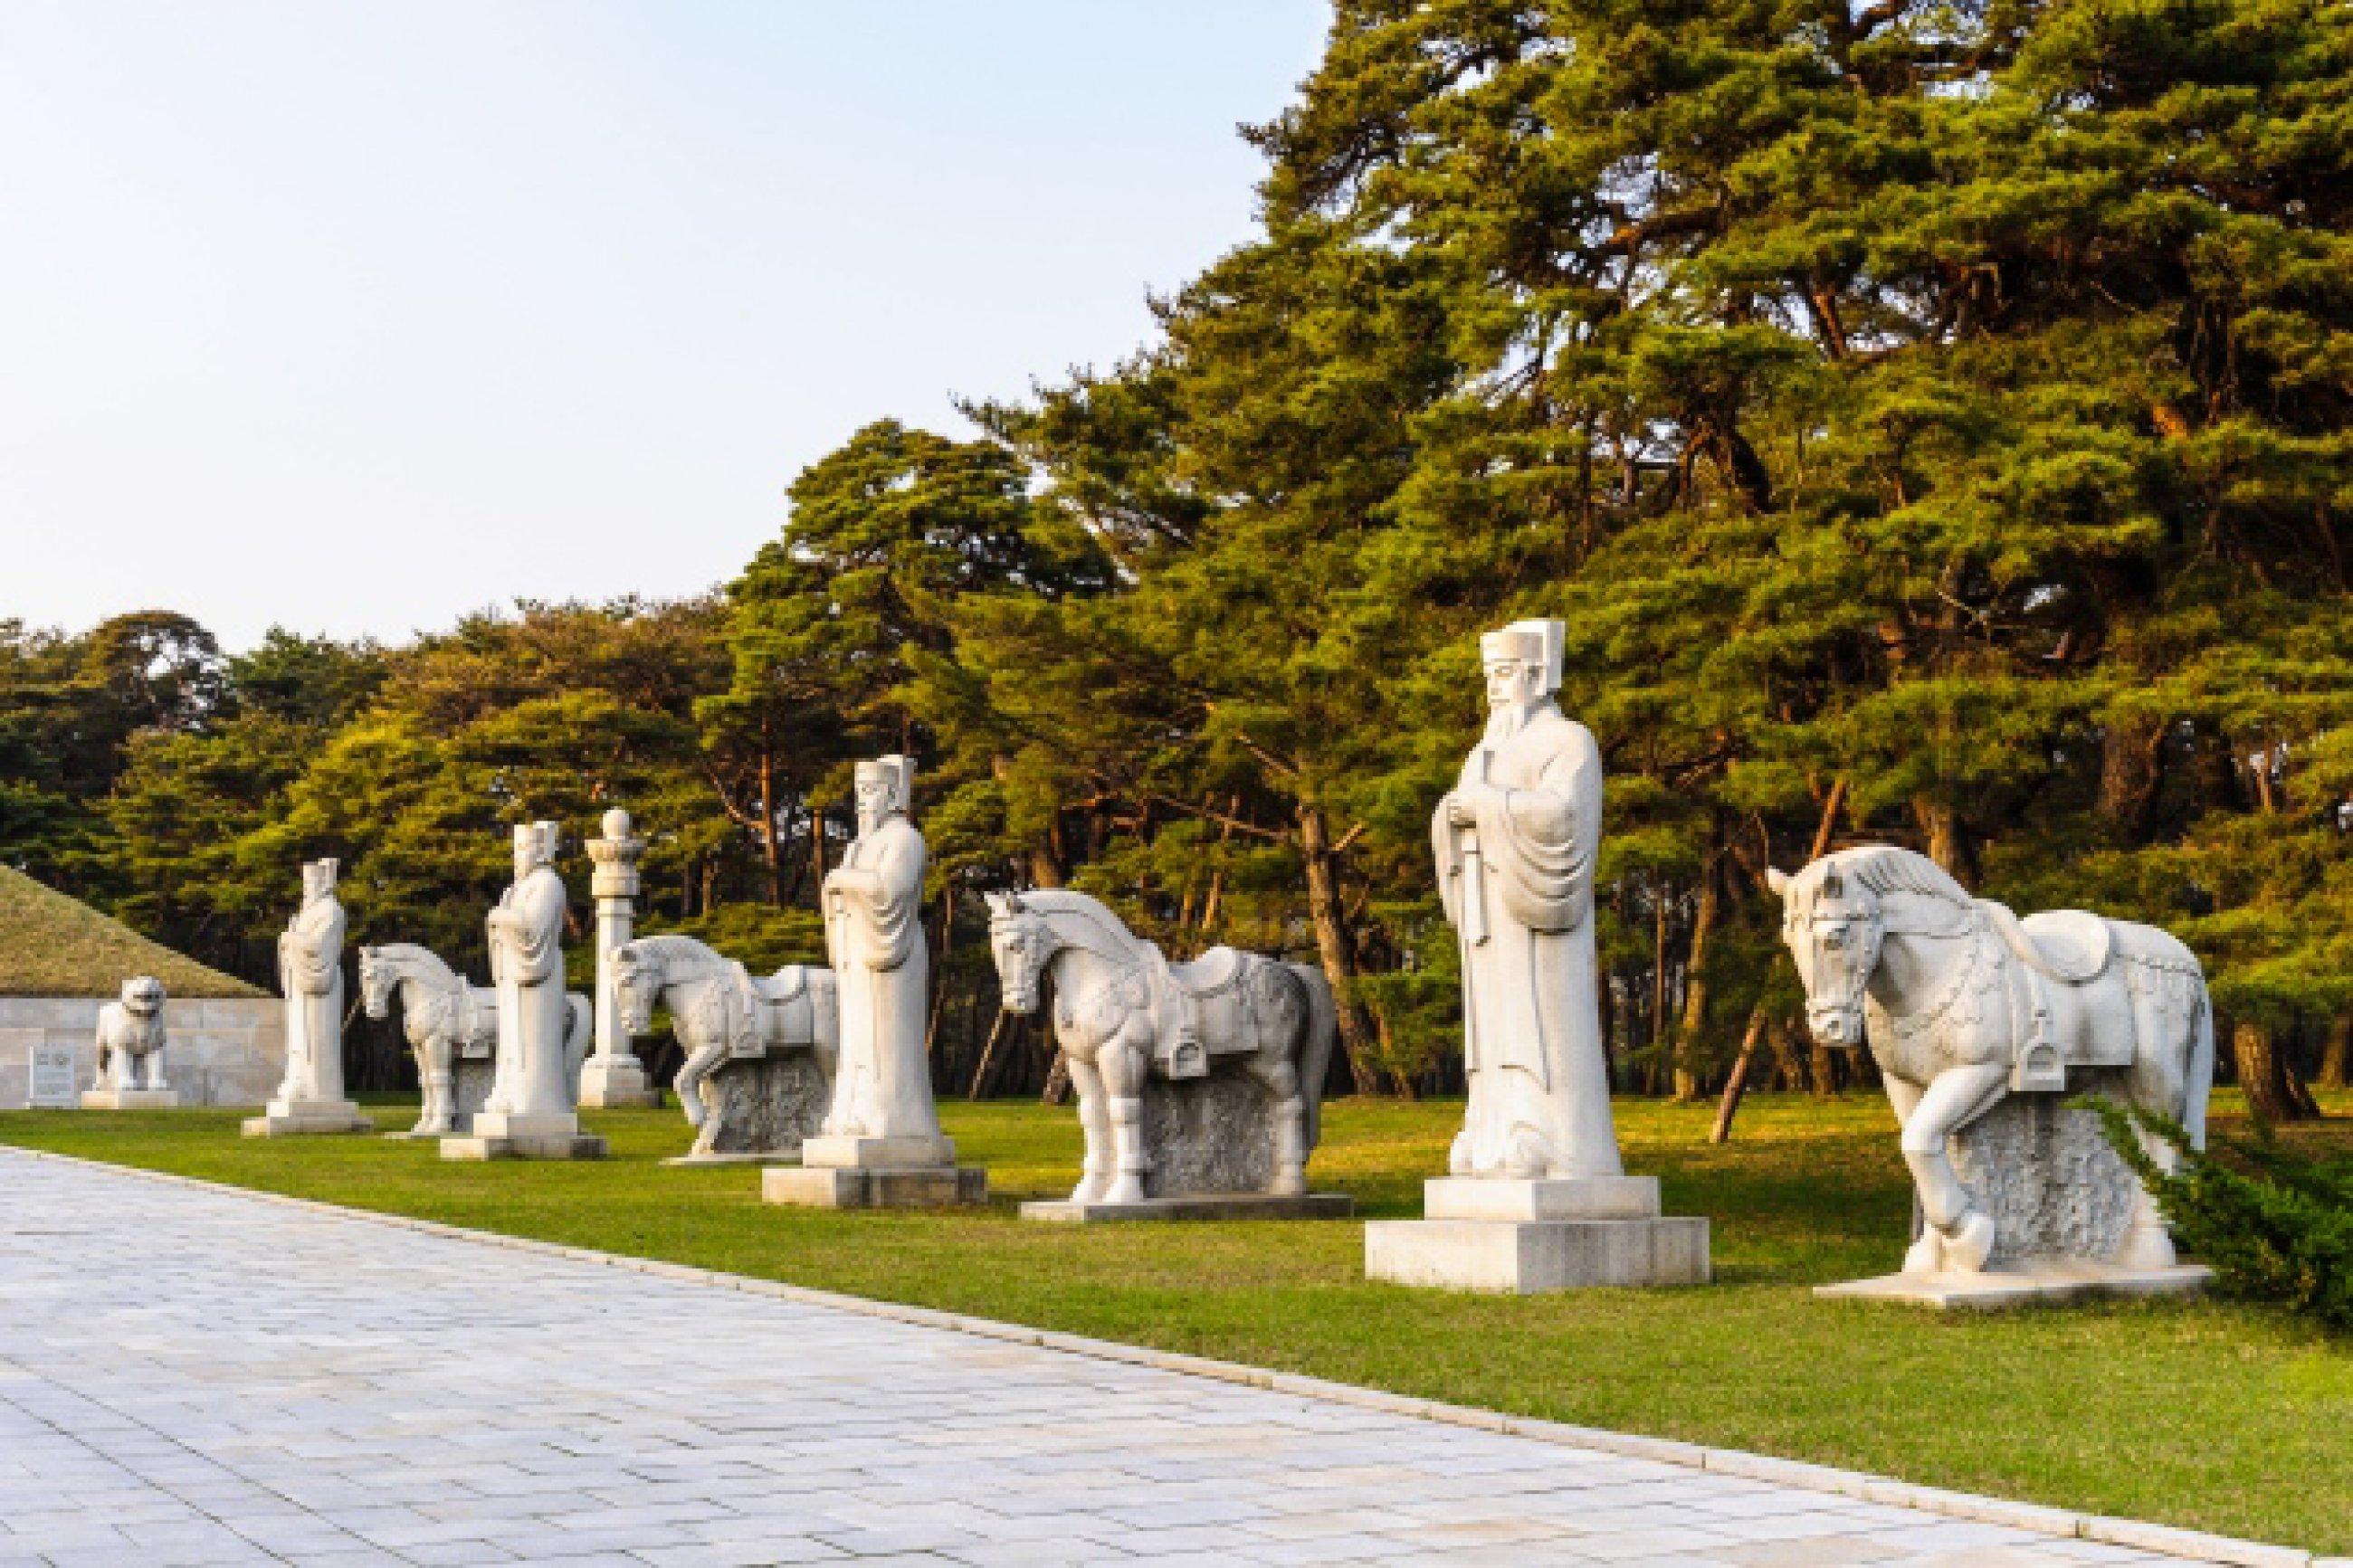 https://bubo.sk/uploads/galleries/7452/statues-on-the-road-to-the-tombs-of-ancient-koguryo-kingdom-pyongyang-north-korea.jpg